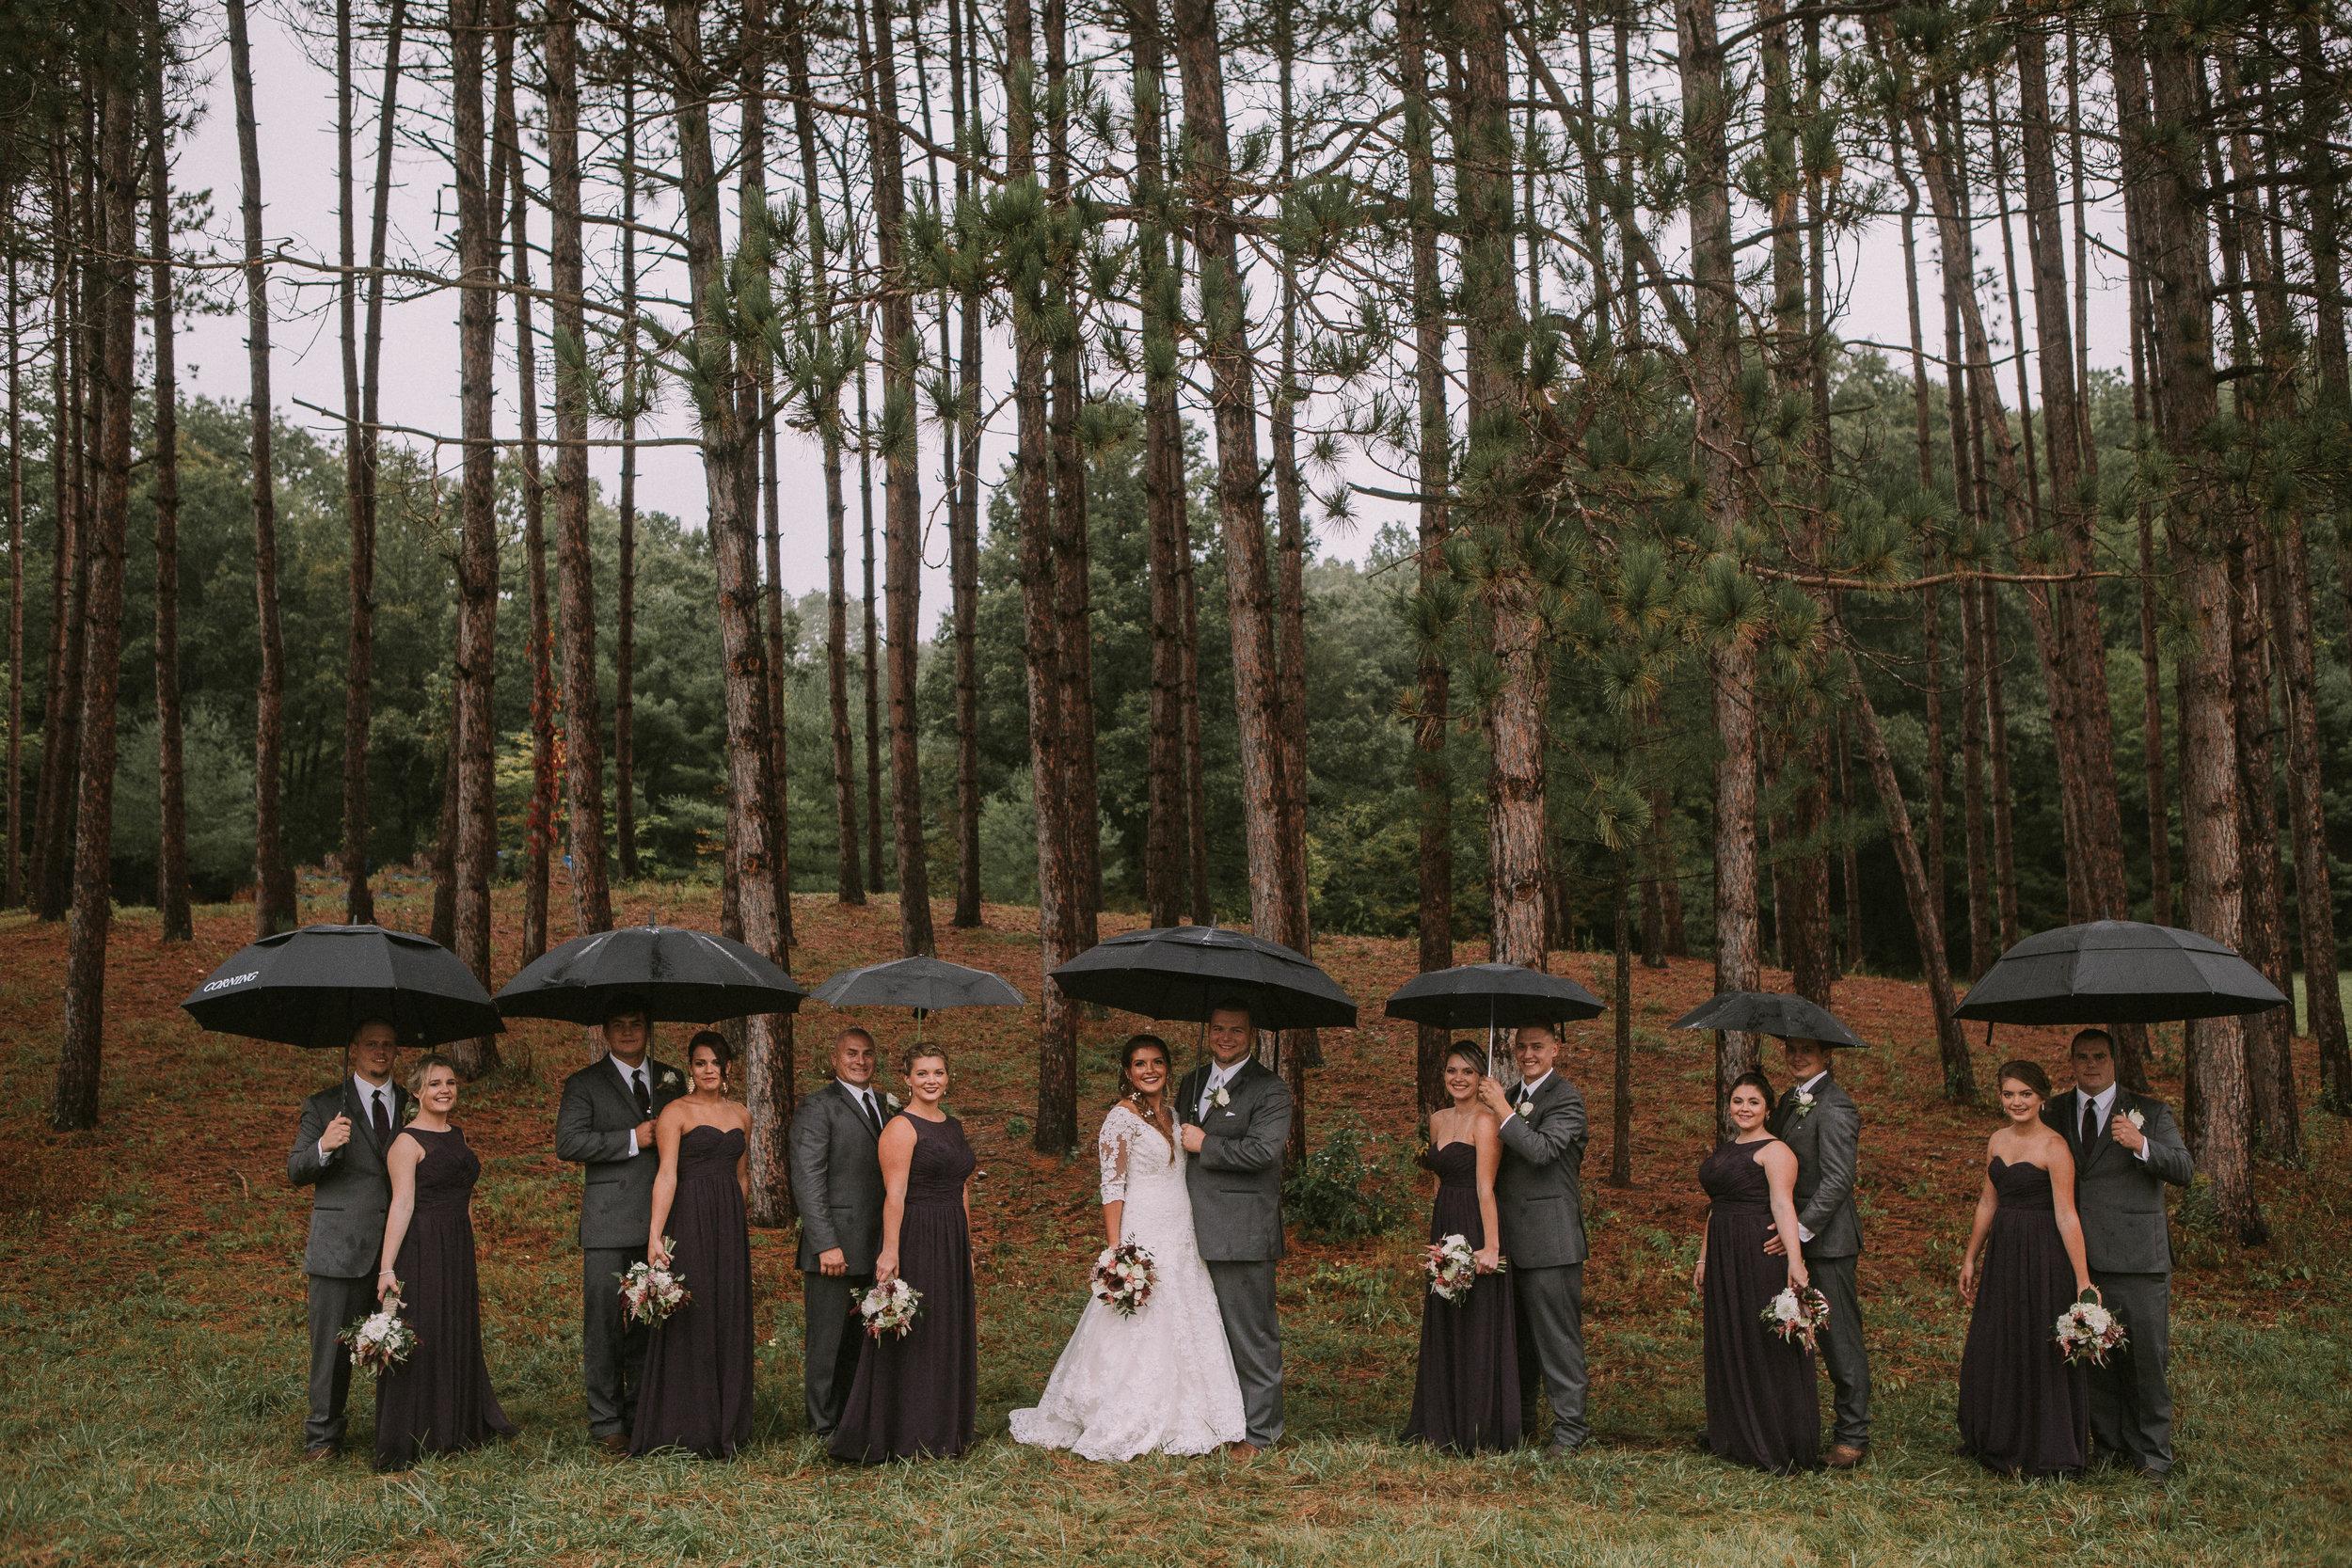 Parker Wedding20161001_0714 copy.jpg